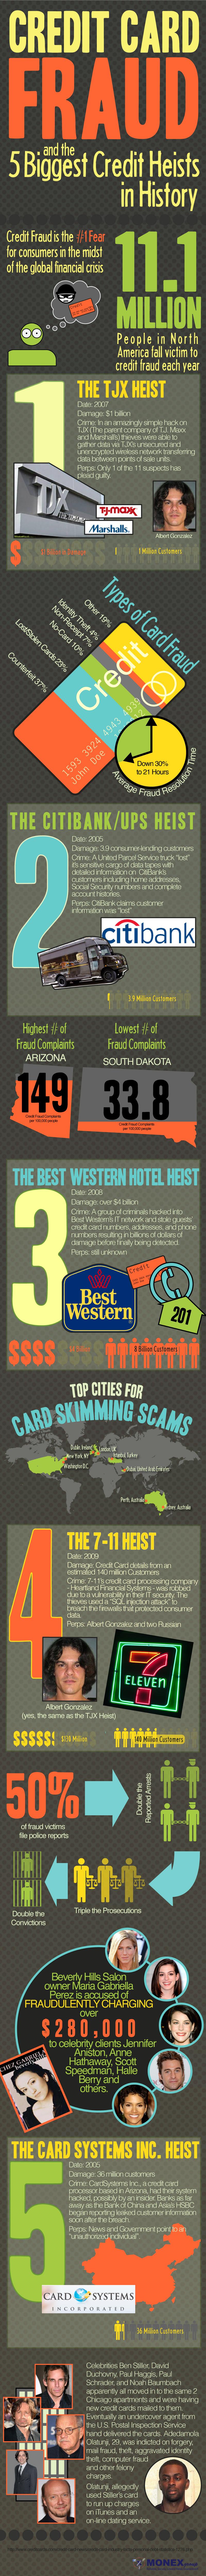 Top 5 Credit Heists in History